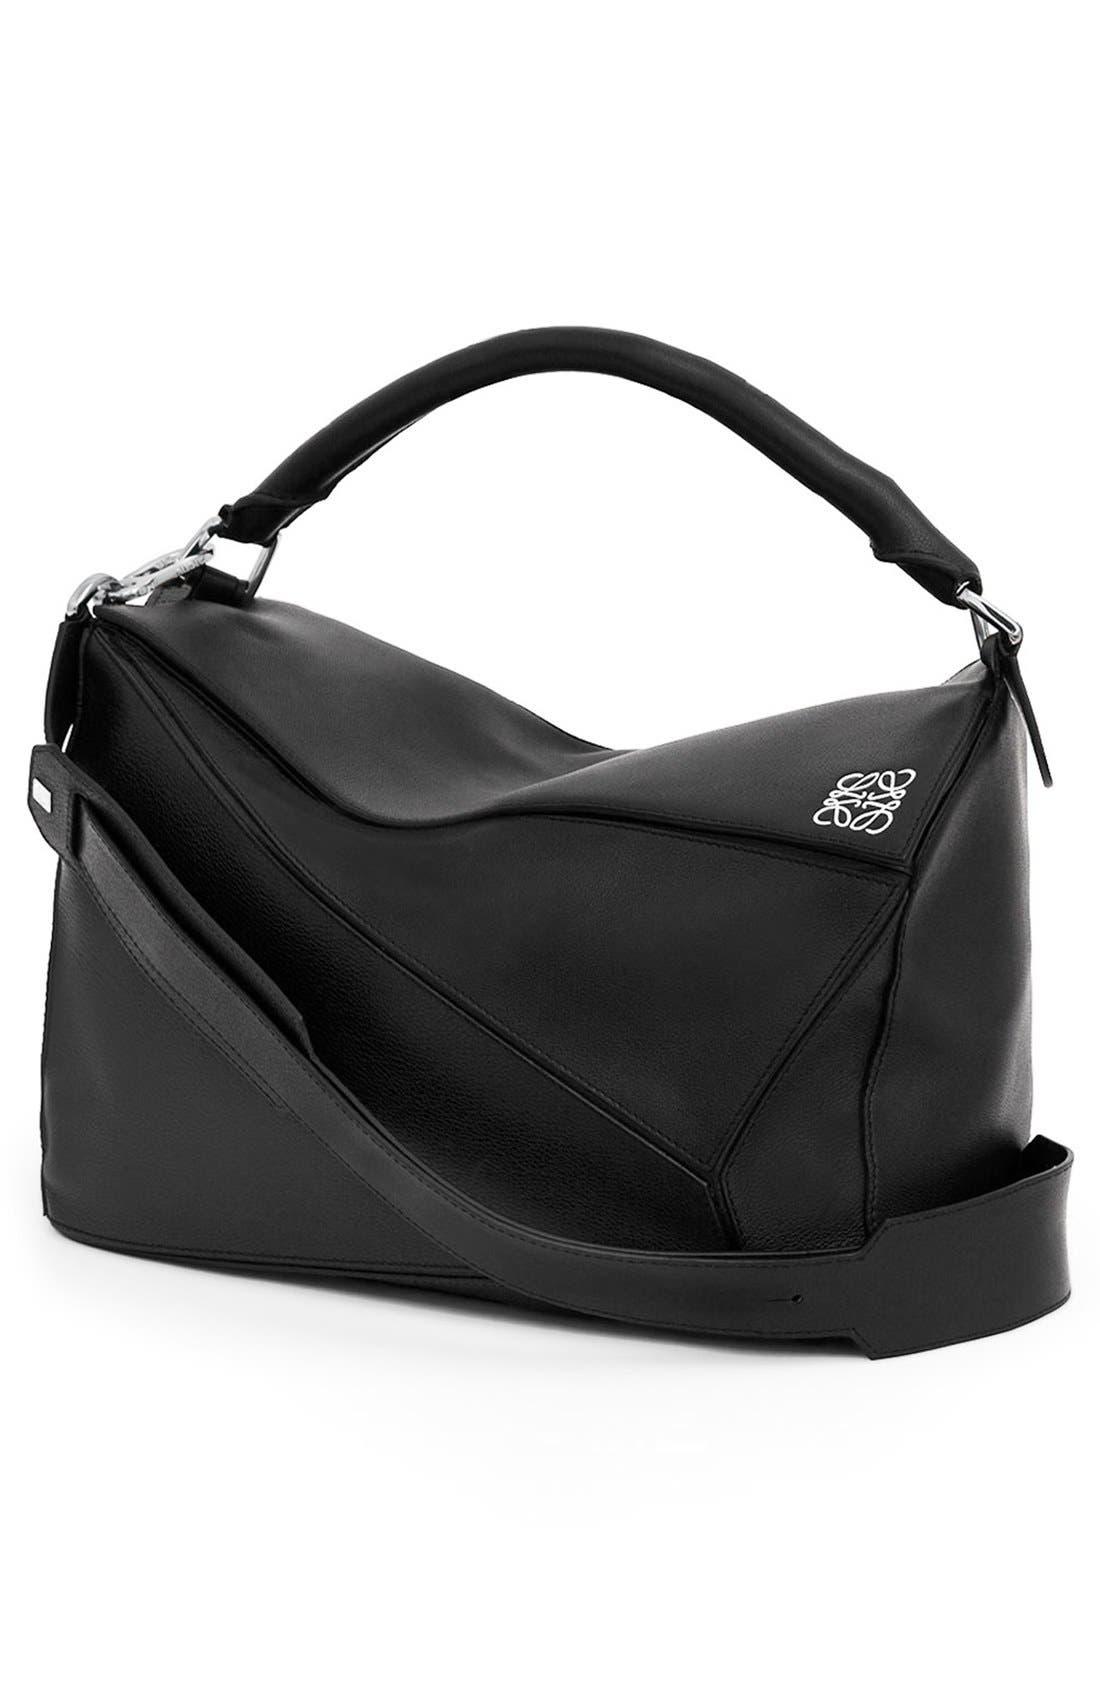 Main Image - Loewe 'Large Puzzle' Calfskin Leather Bag